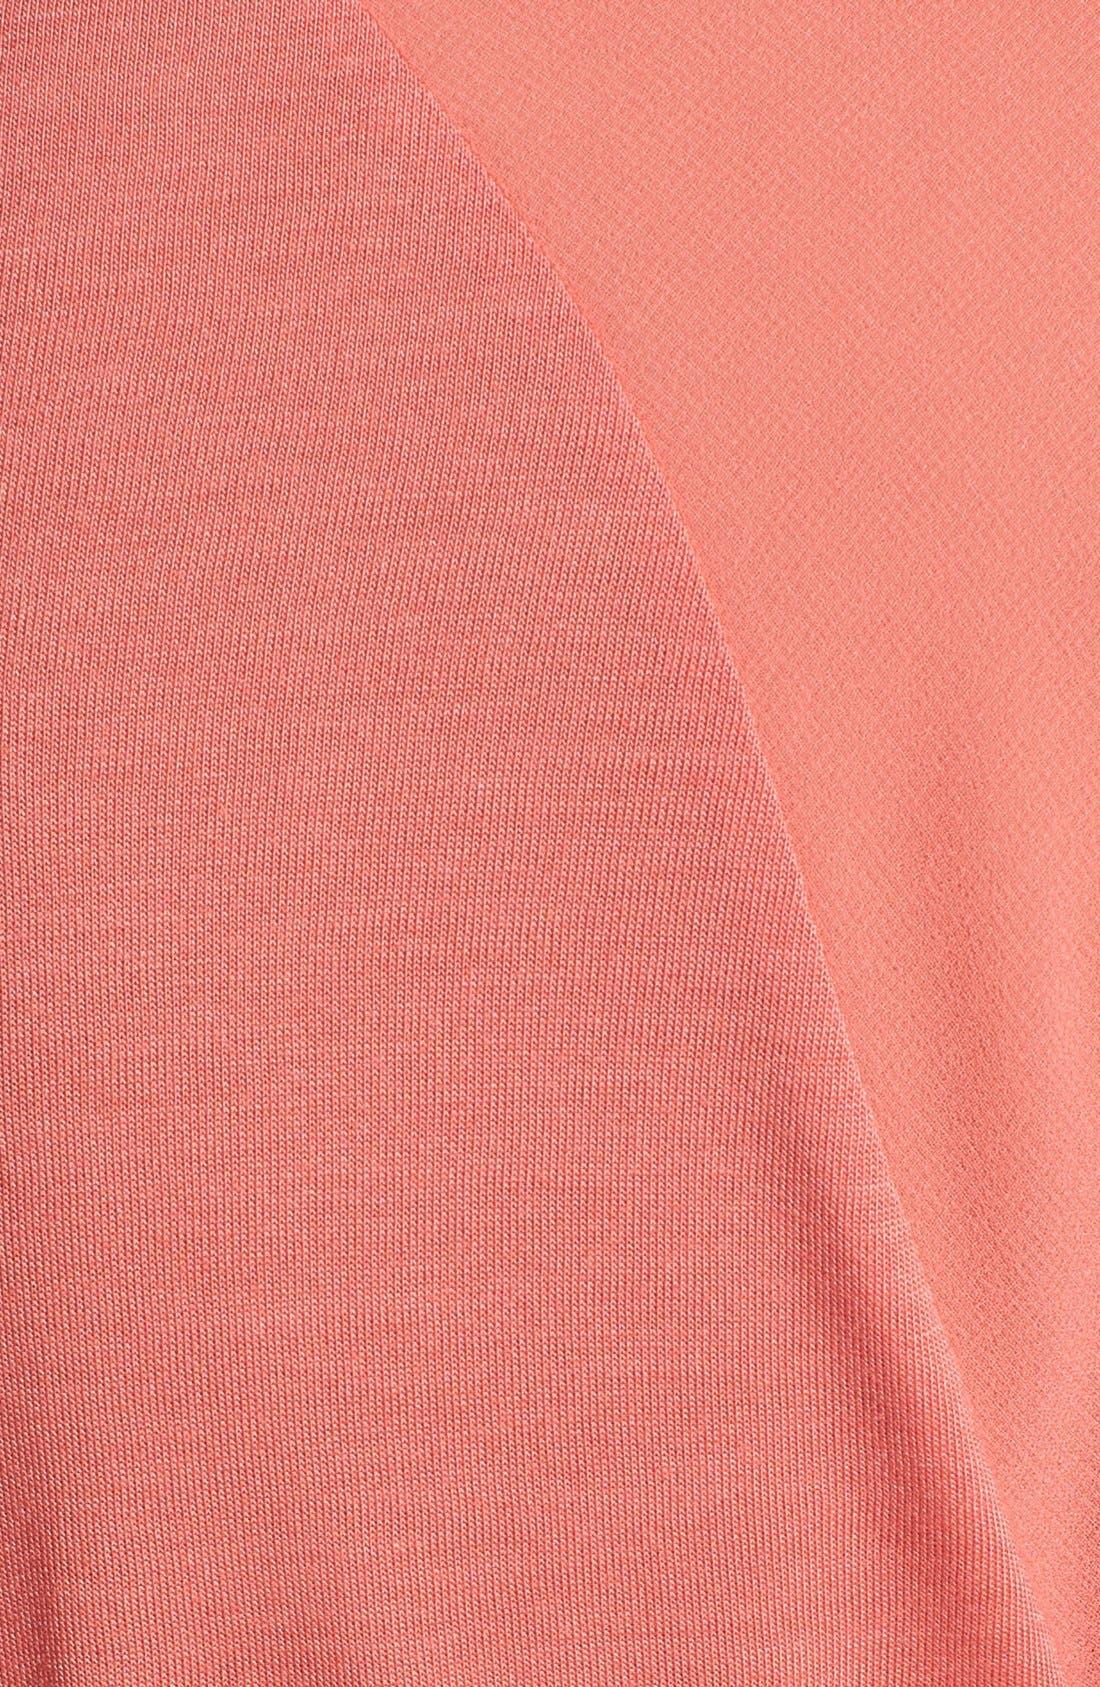 Alternate Image 3  - NYDJ Sheer Yoke Short Sleeve Top